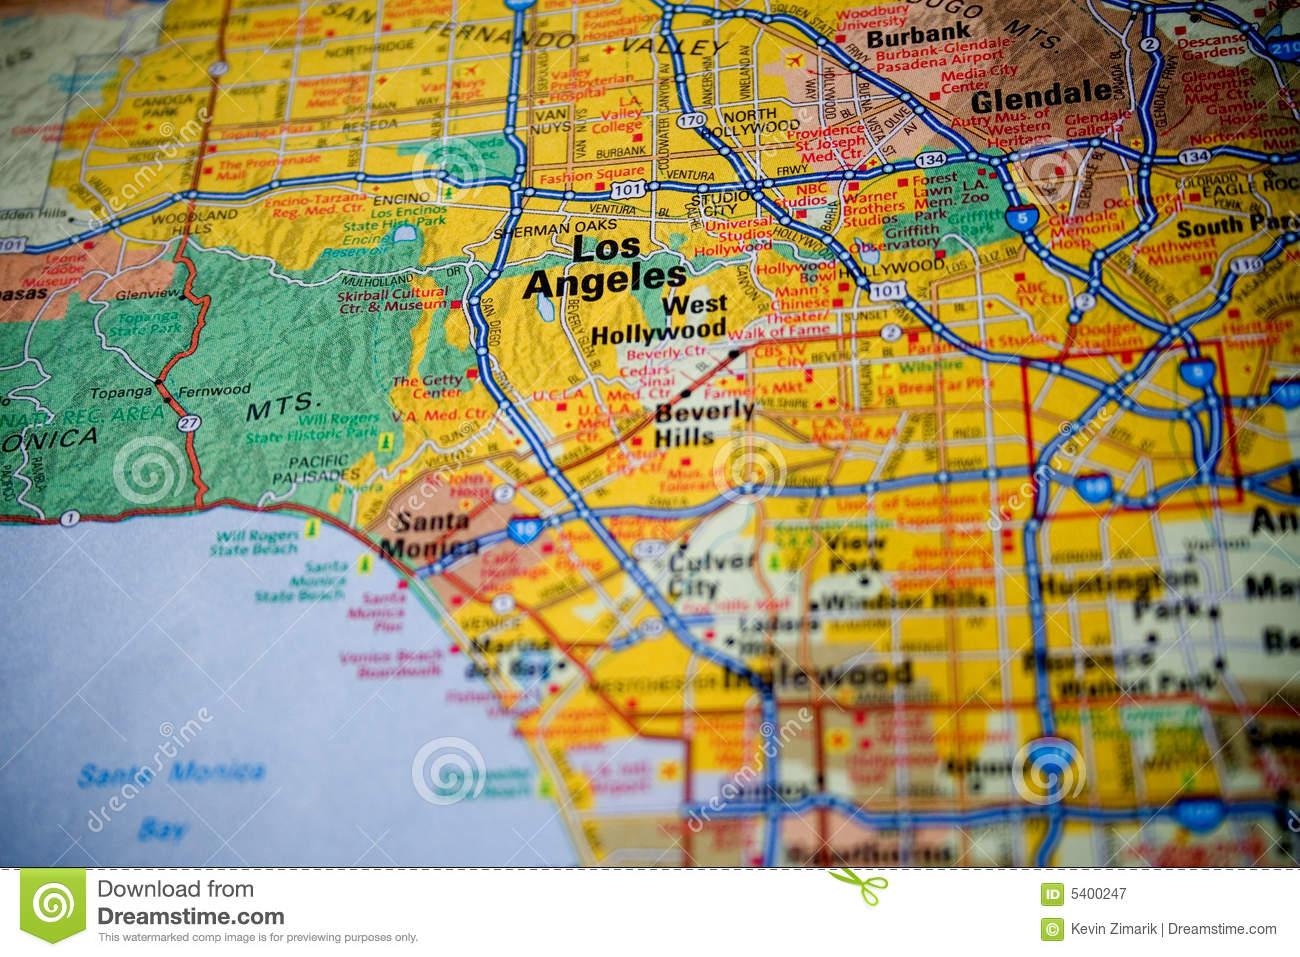 Field Maps - California Soccer League, Inc